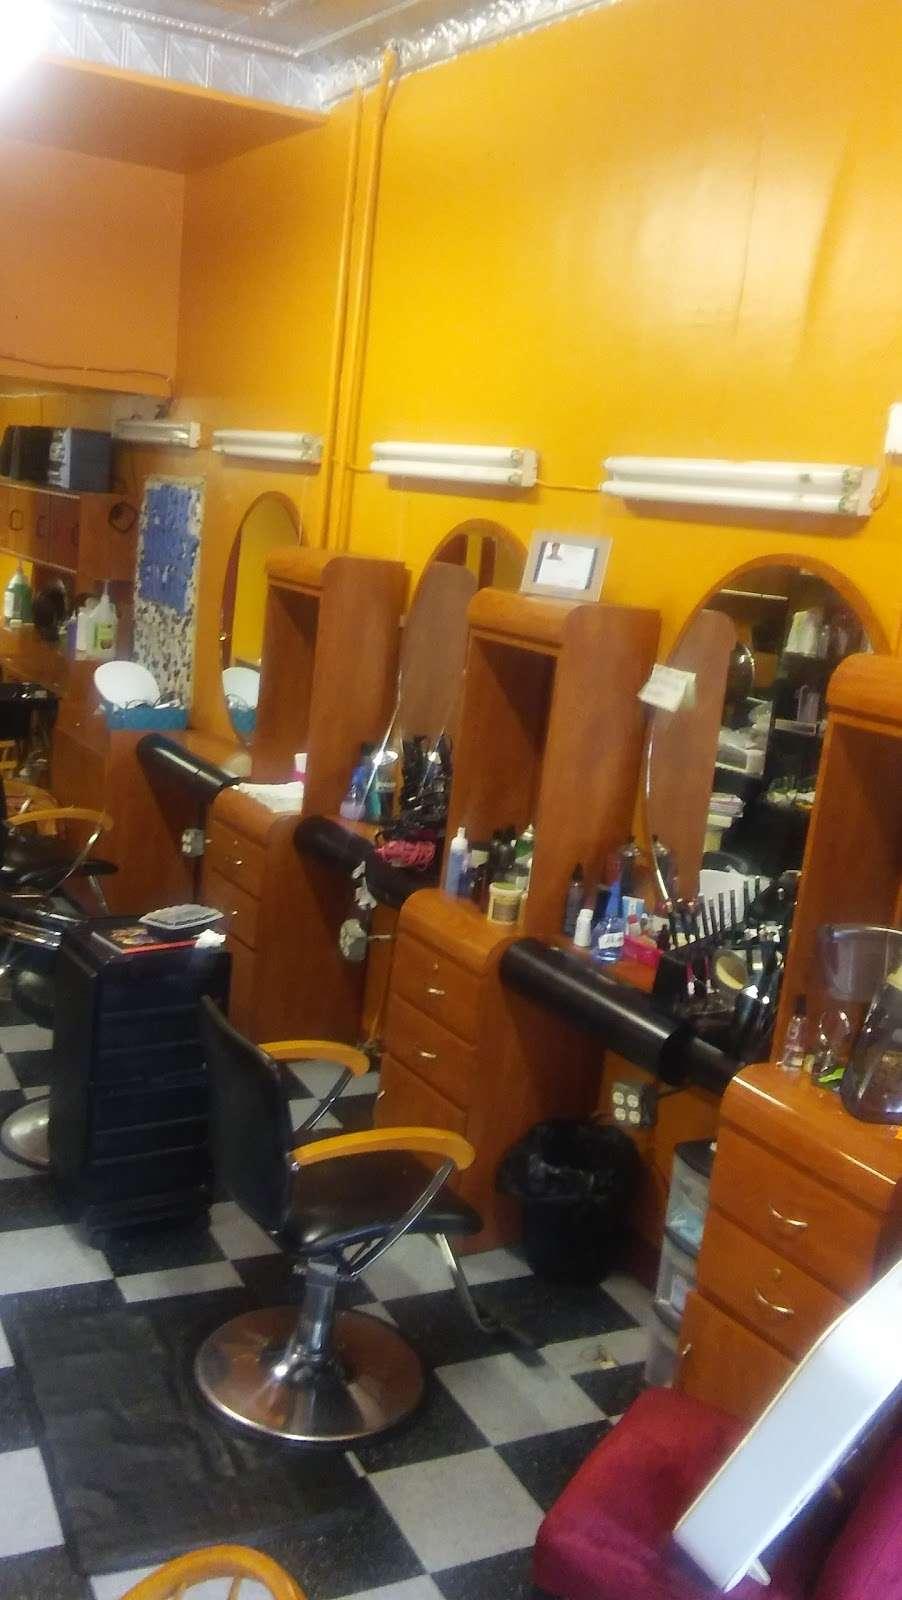 Posh Unisex Beauty Salon - hair care    Photo 2 of 10   Address: Springdale Ave, East Orange, NJ 07017, USA   Phone: (973) 519-1990